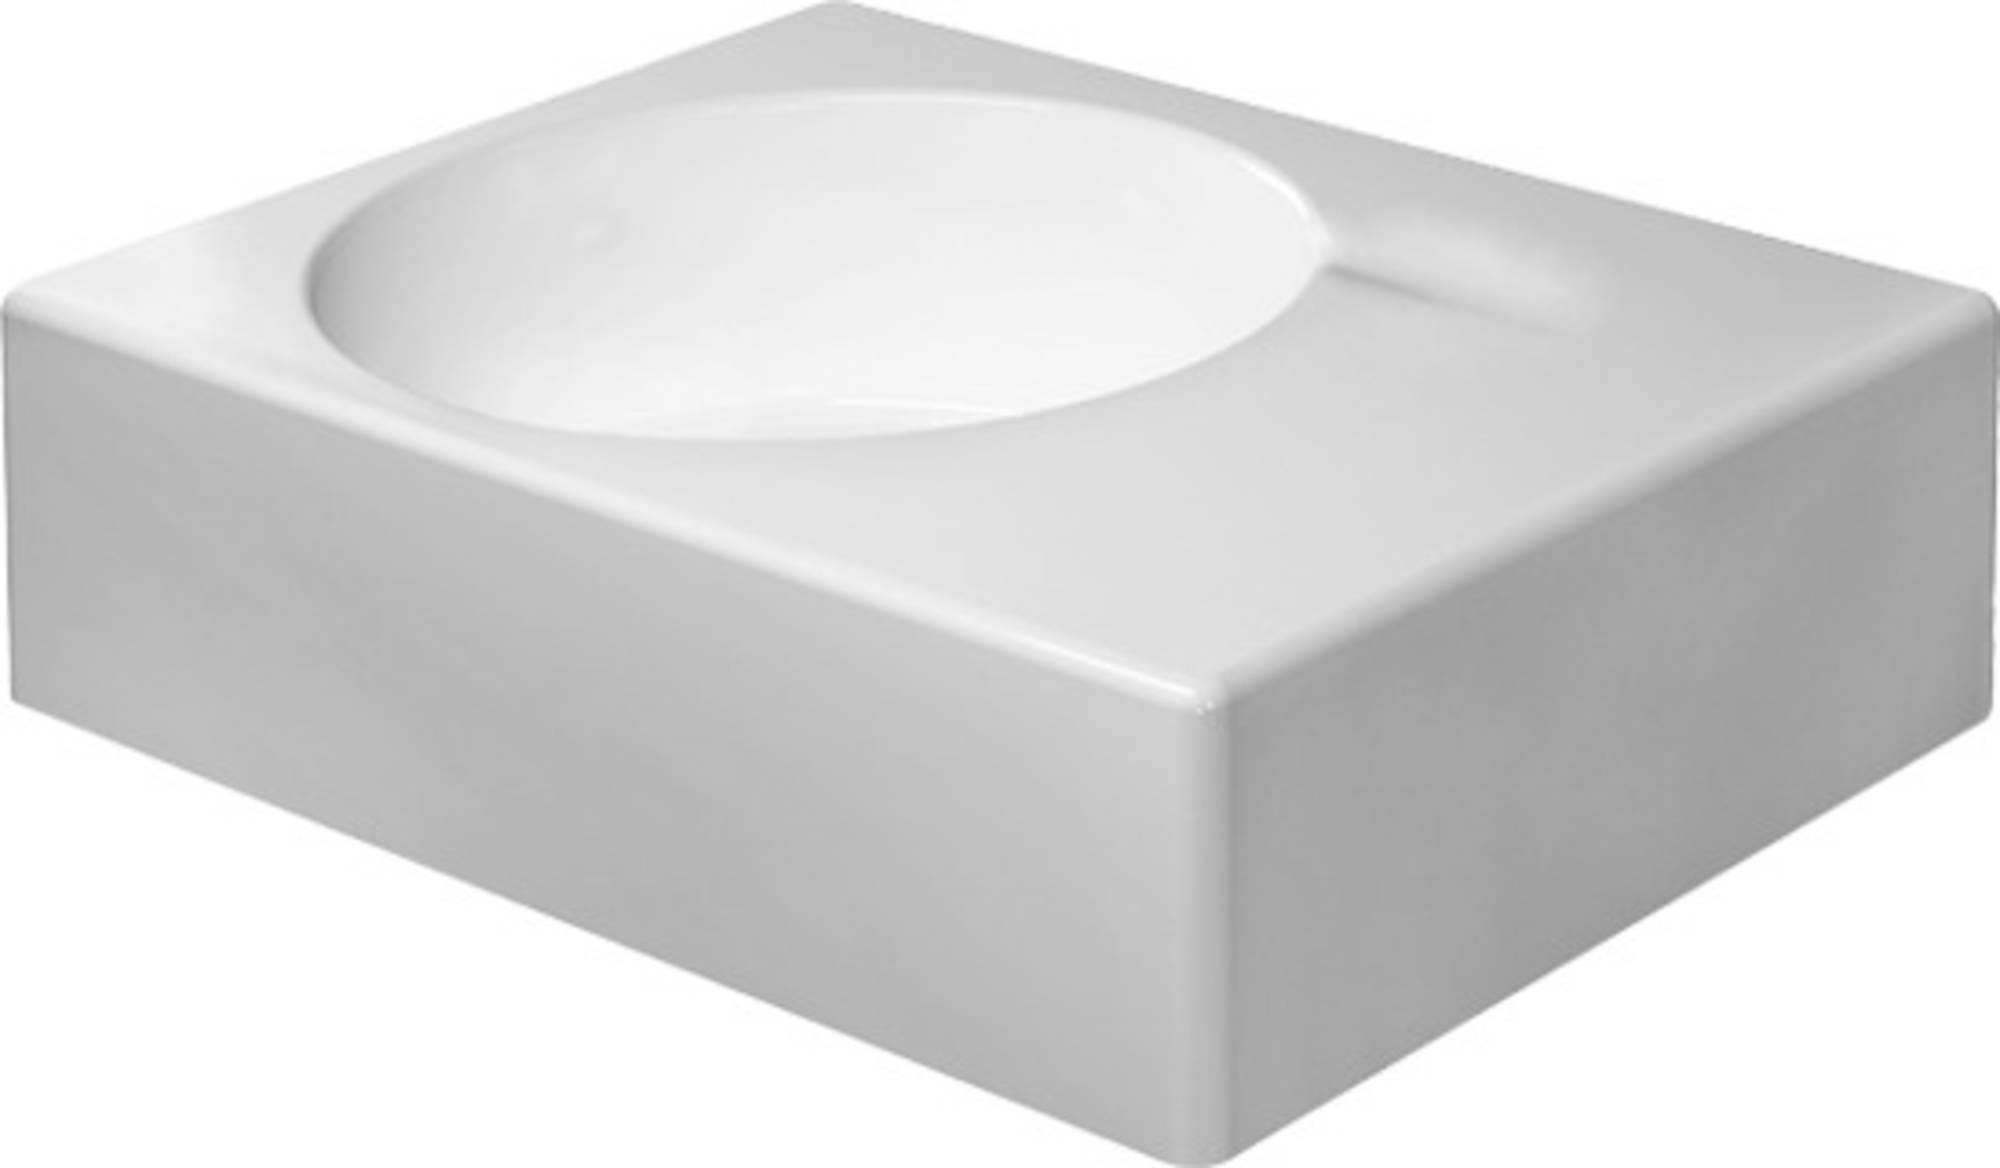 Duravit Design Variations Scola wastafel bak links 61.5x46cm m. kraangat wit